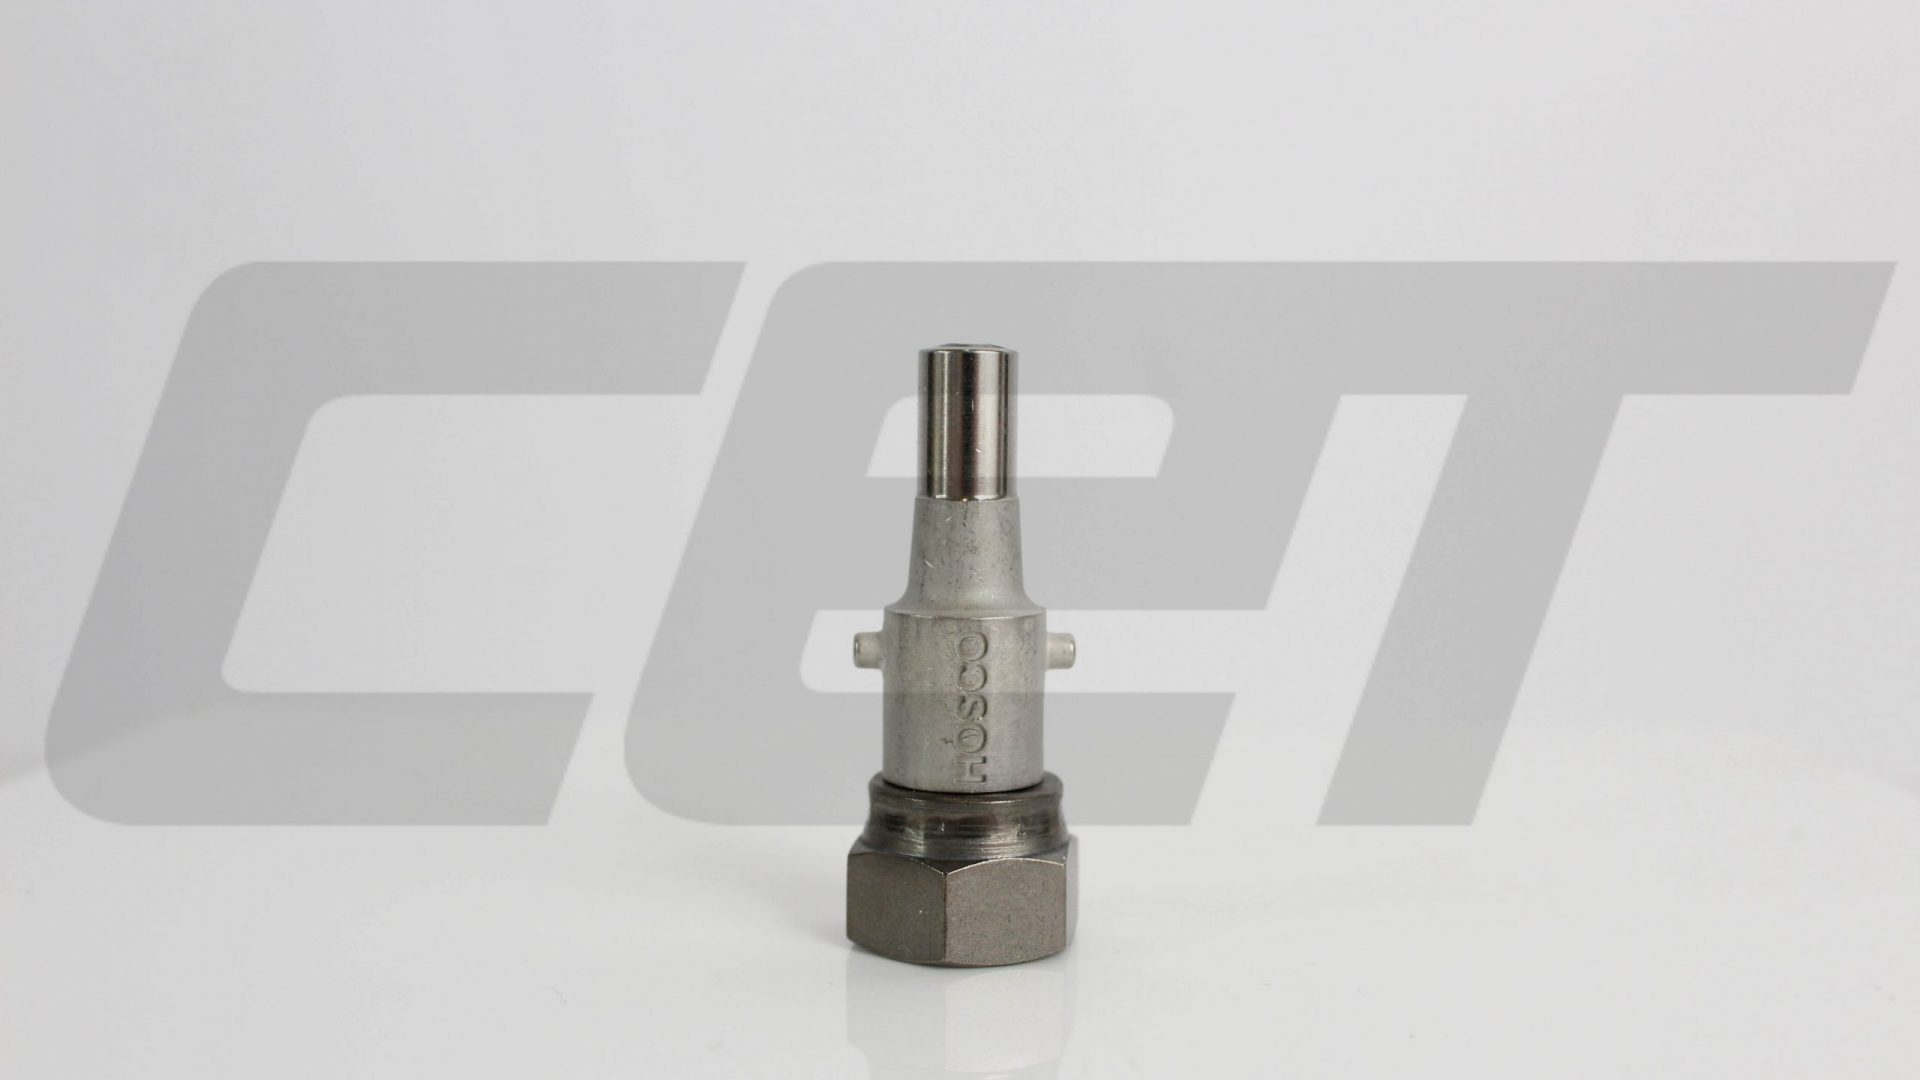 SS-STEM-6-316